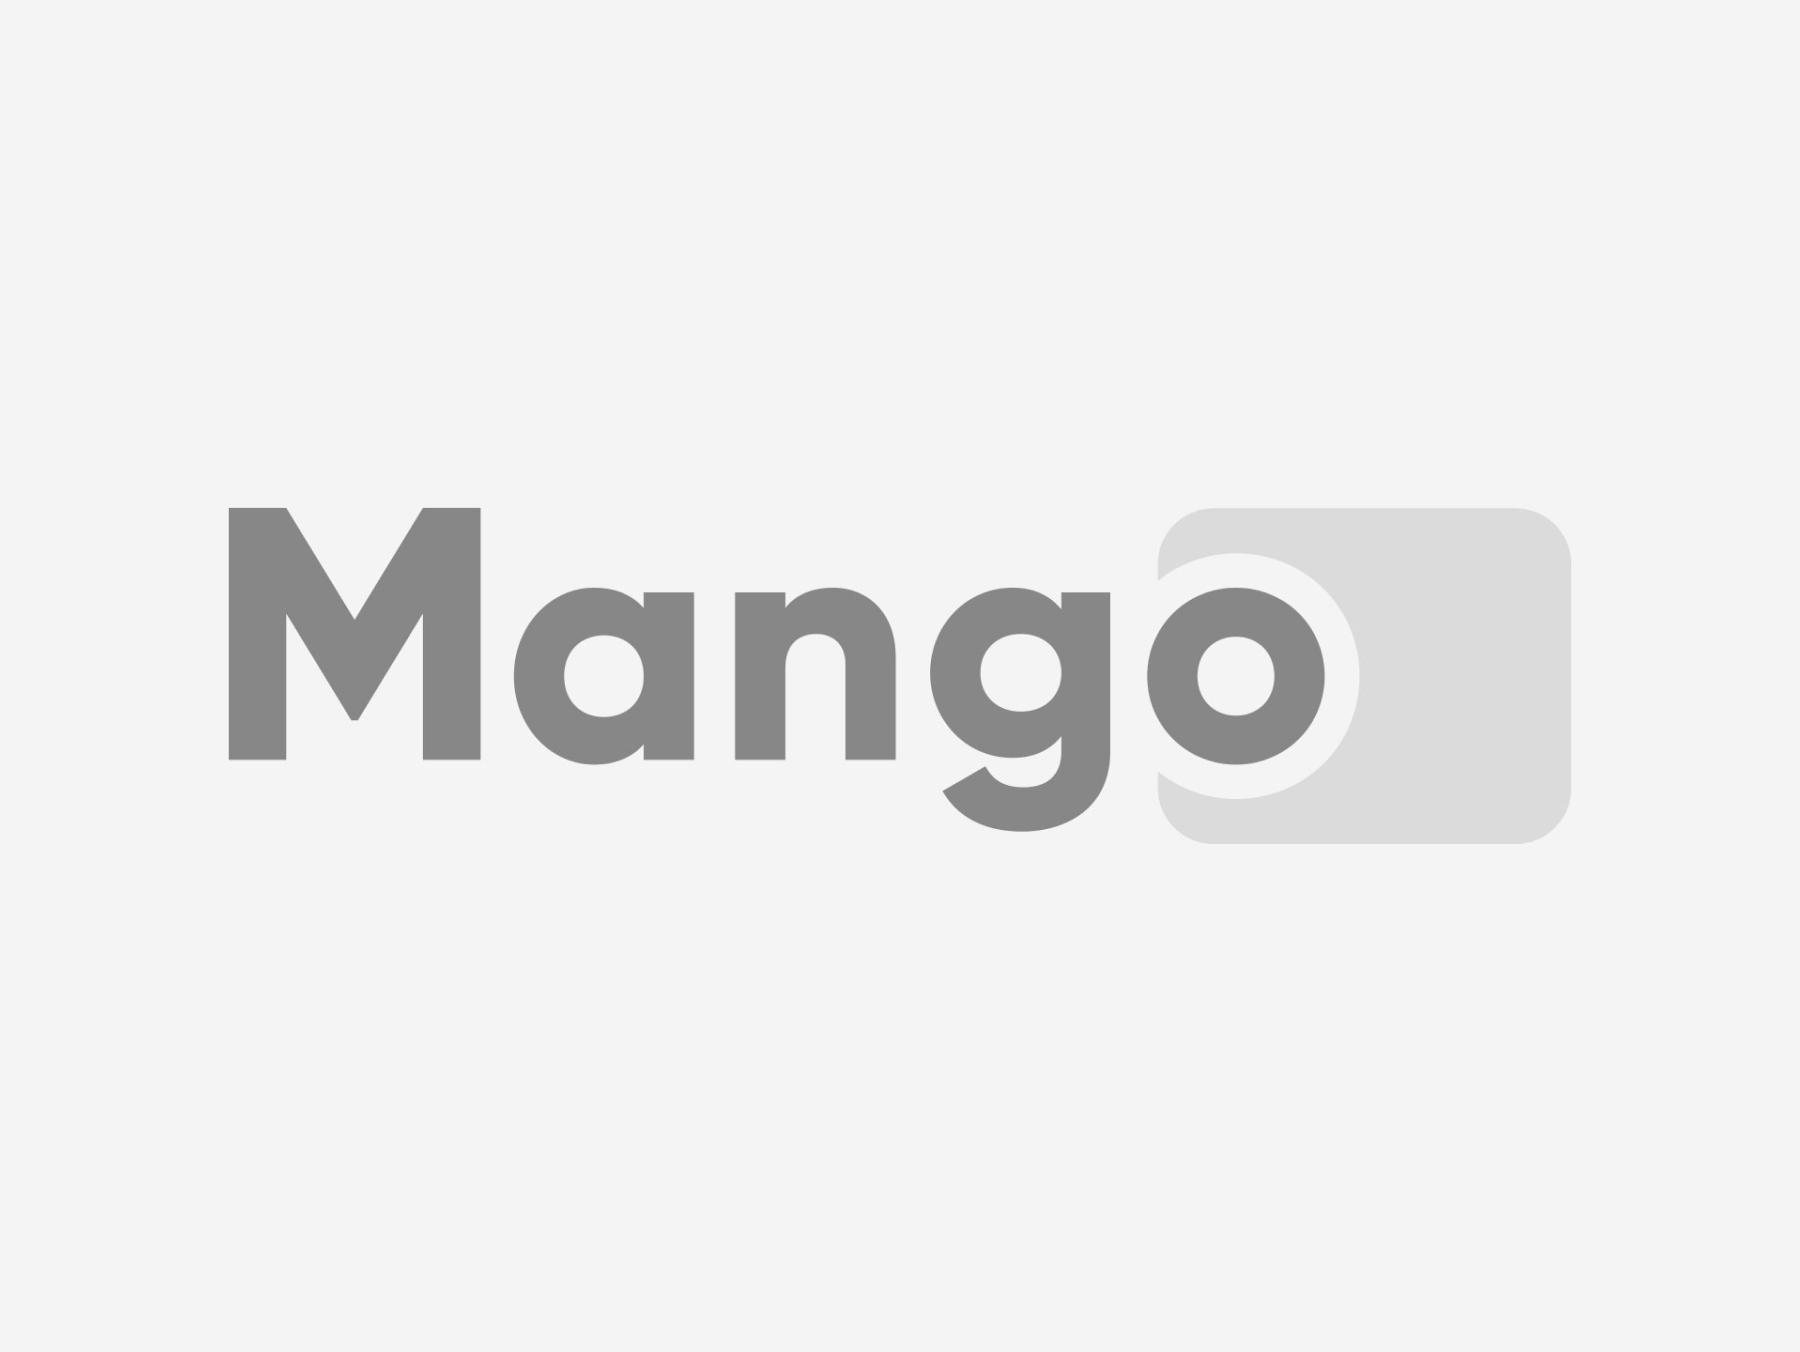 Teniși 4.0, Leisure Shoes 2019 Walkmaxx Comfort